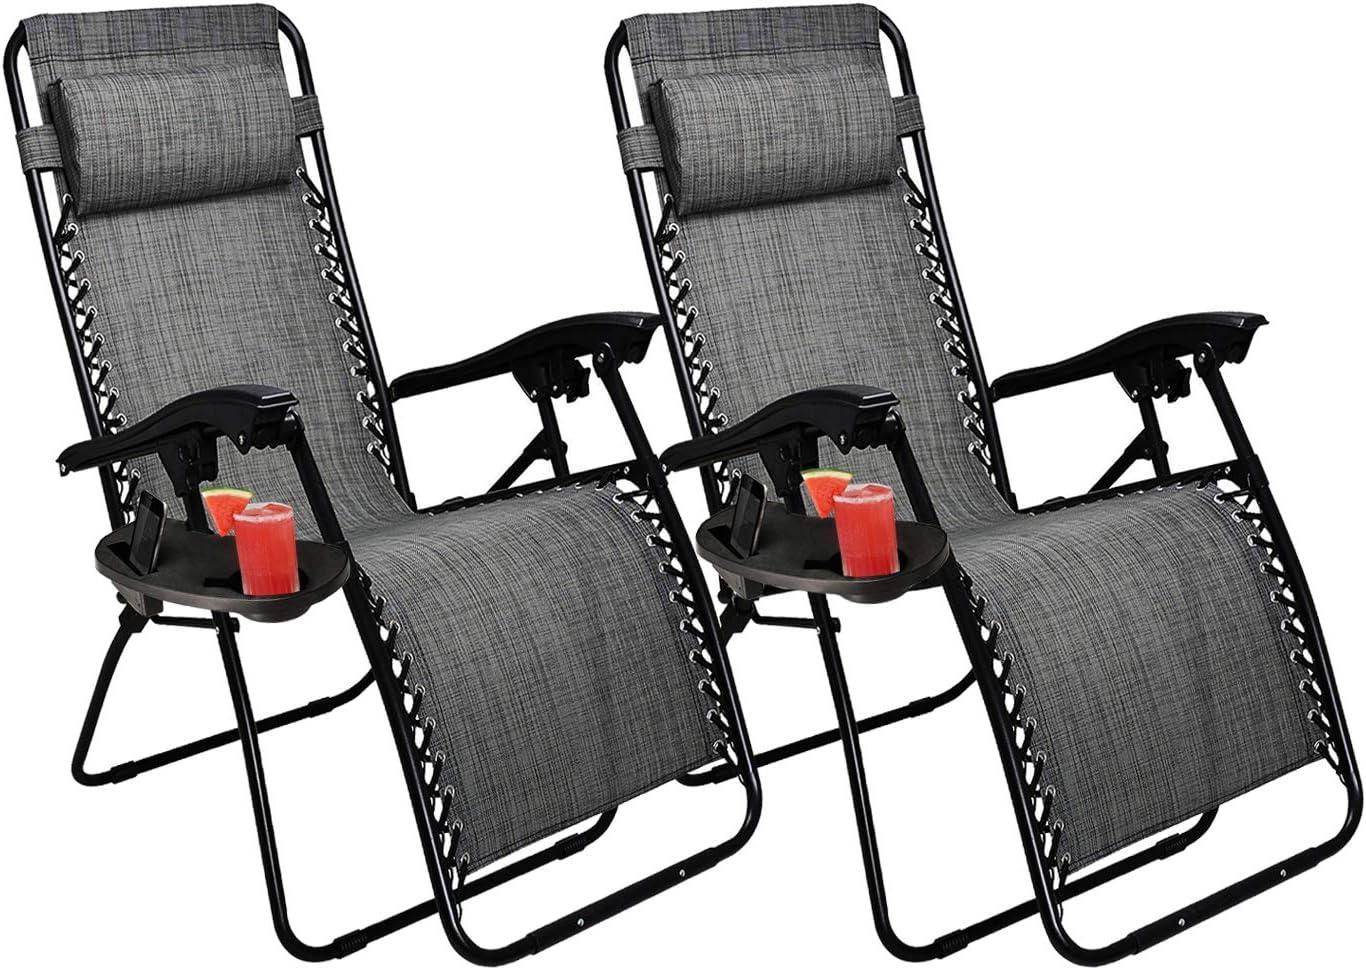 Lounger Deck Chairs Garden Outdoor Patio Sun Loungers KEPLIN Set of 2 Heavy Duty Textoline Zero Gravity Chairs Folding Reclining Chairs GREEN